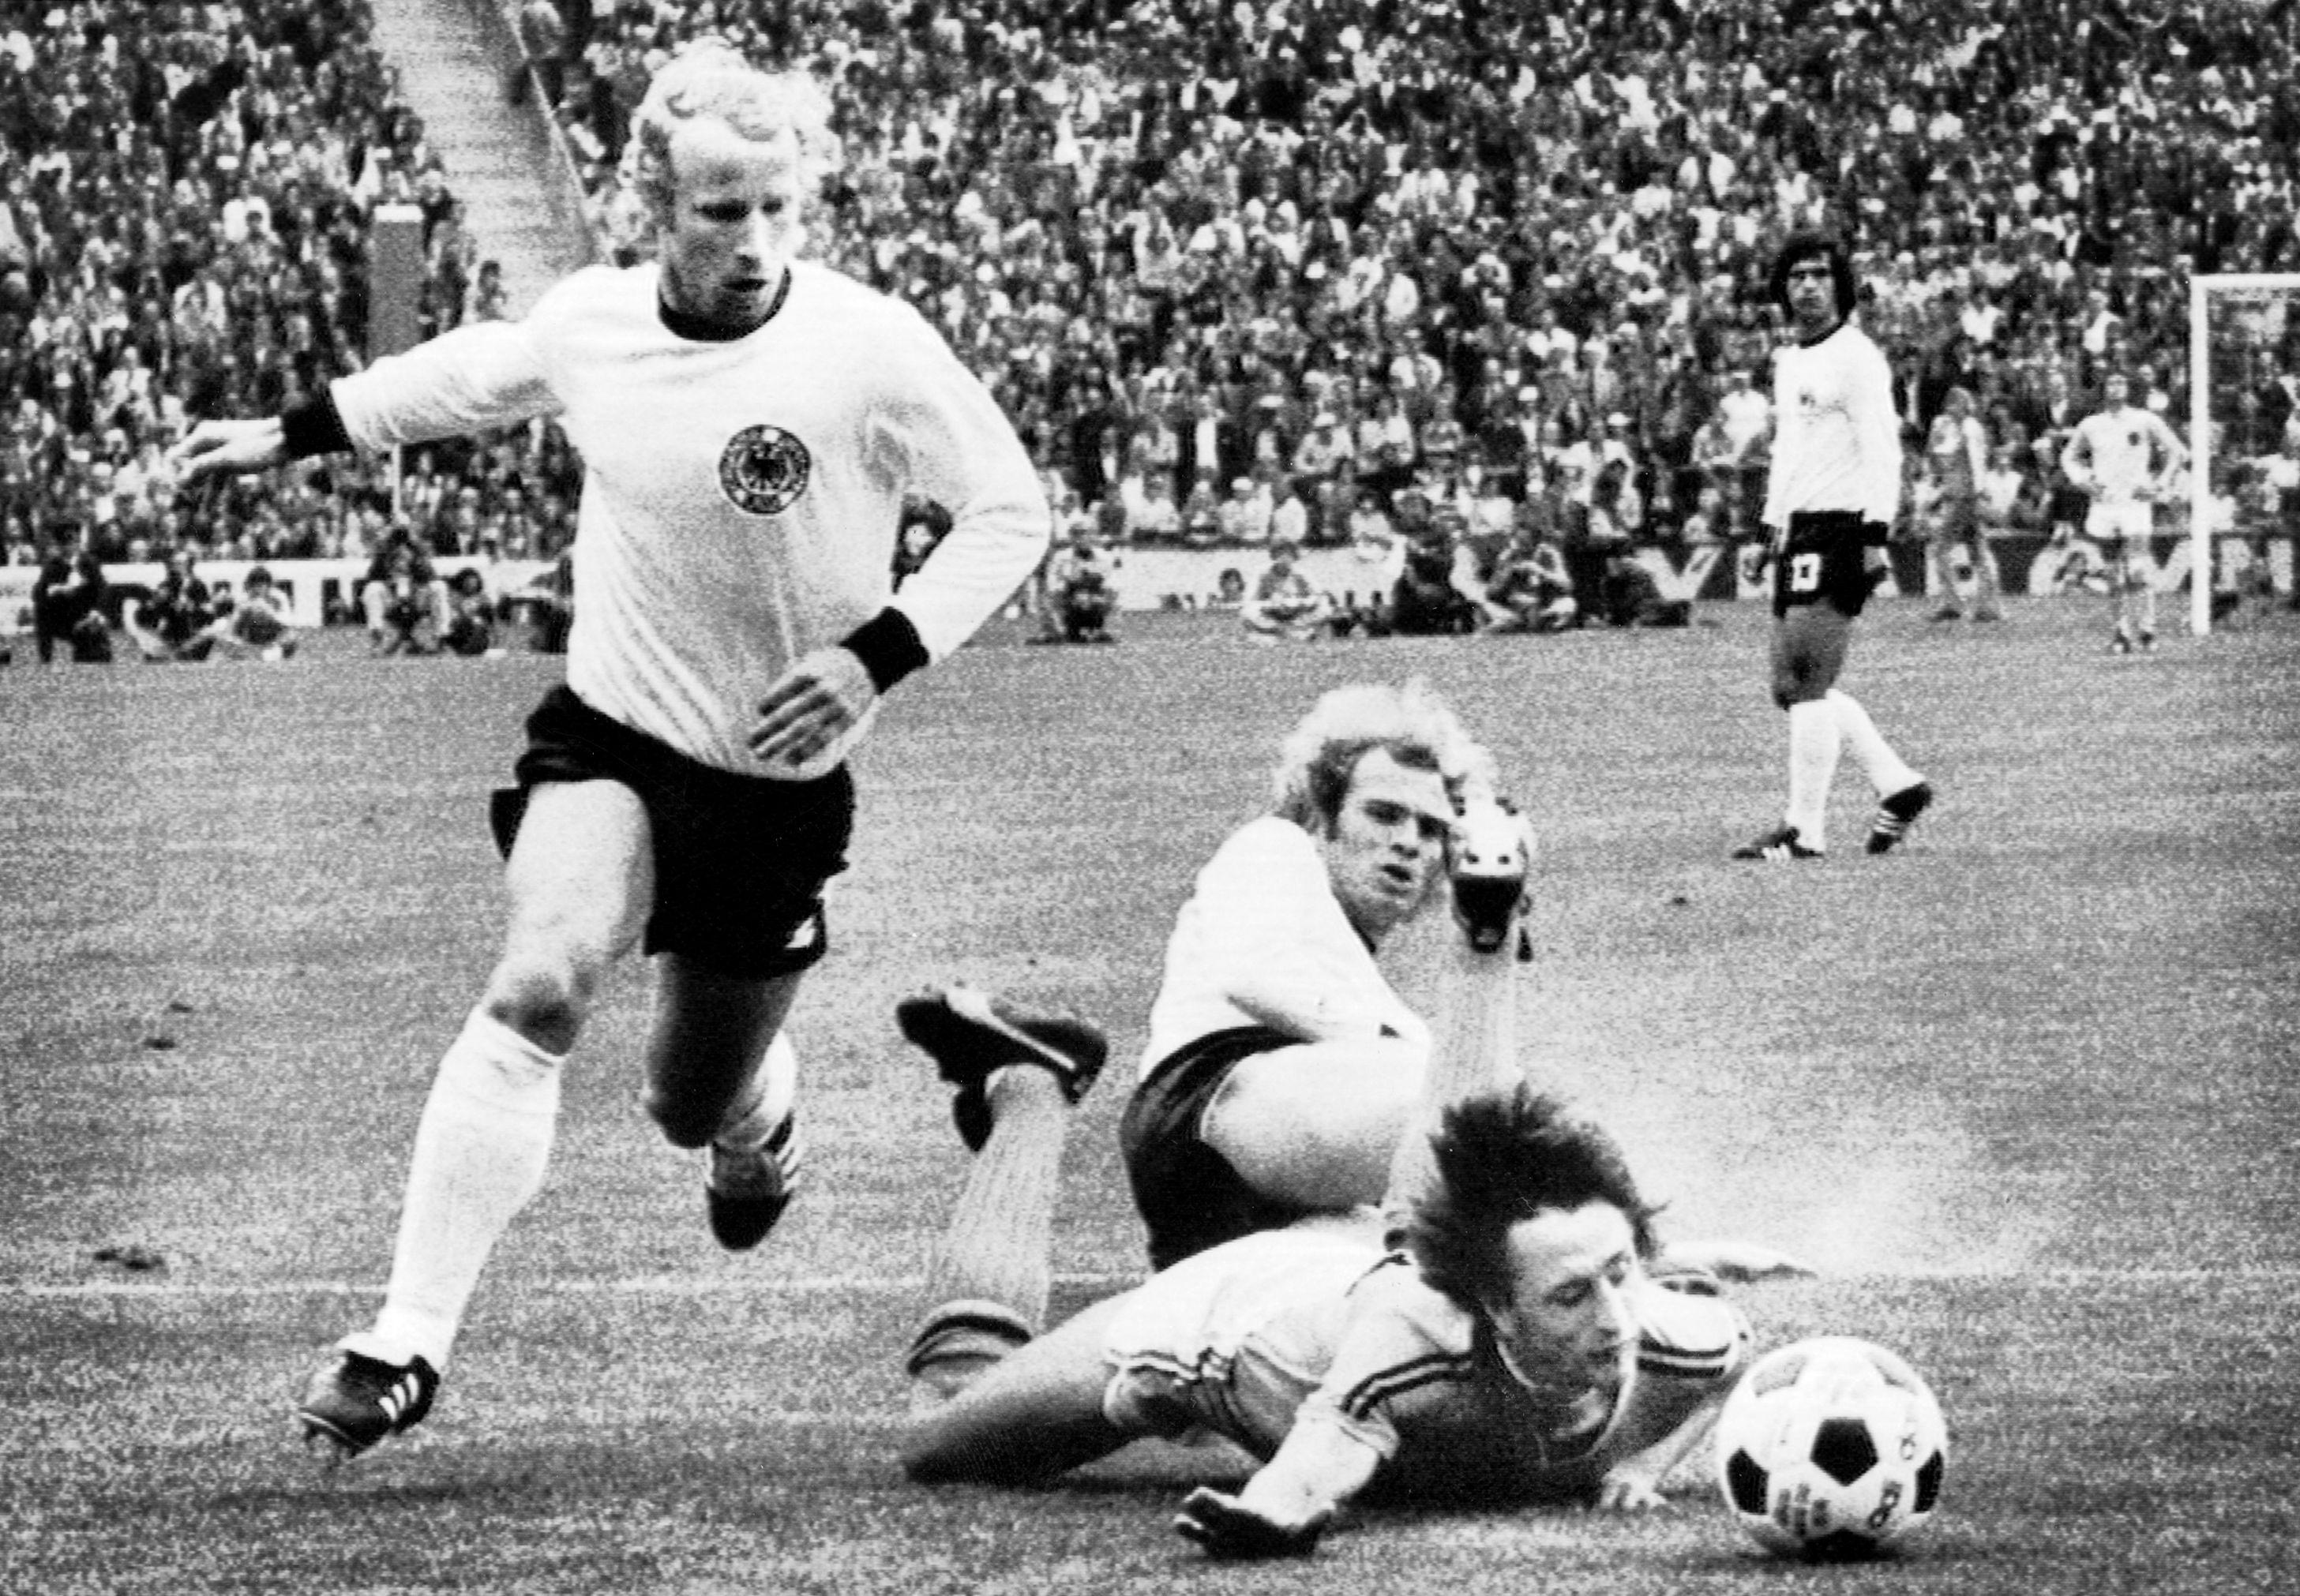 740707 Fotboll, VM, Final, VŠsttyskland - Holland: Uli Hoeness, VŠsttyskland fŠller Johann Cruyff, Holland © BildbyrŒn - Cop 45